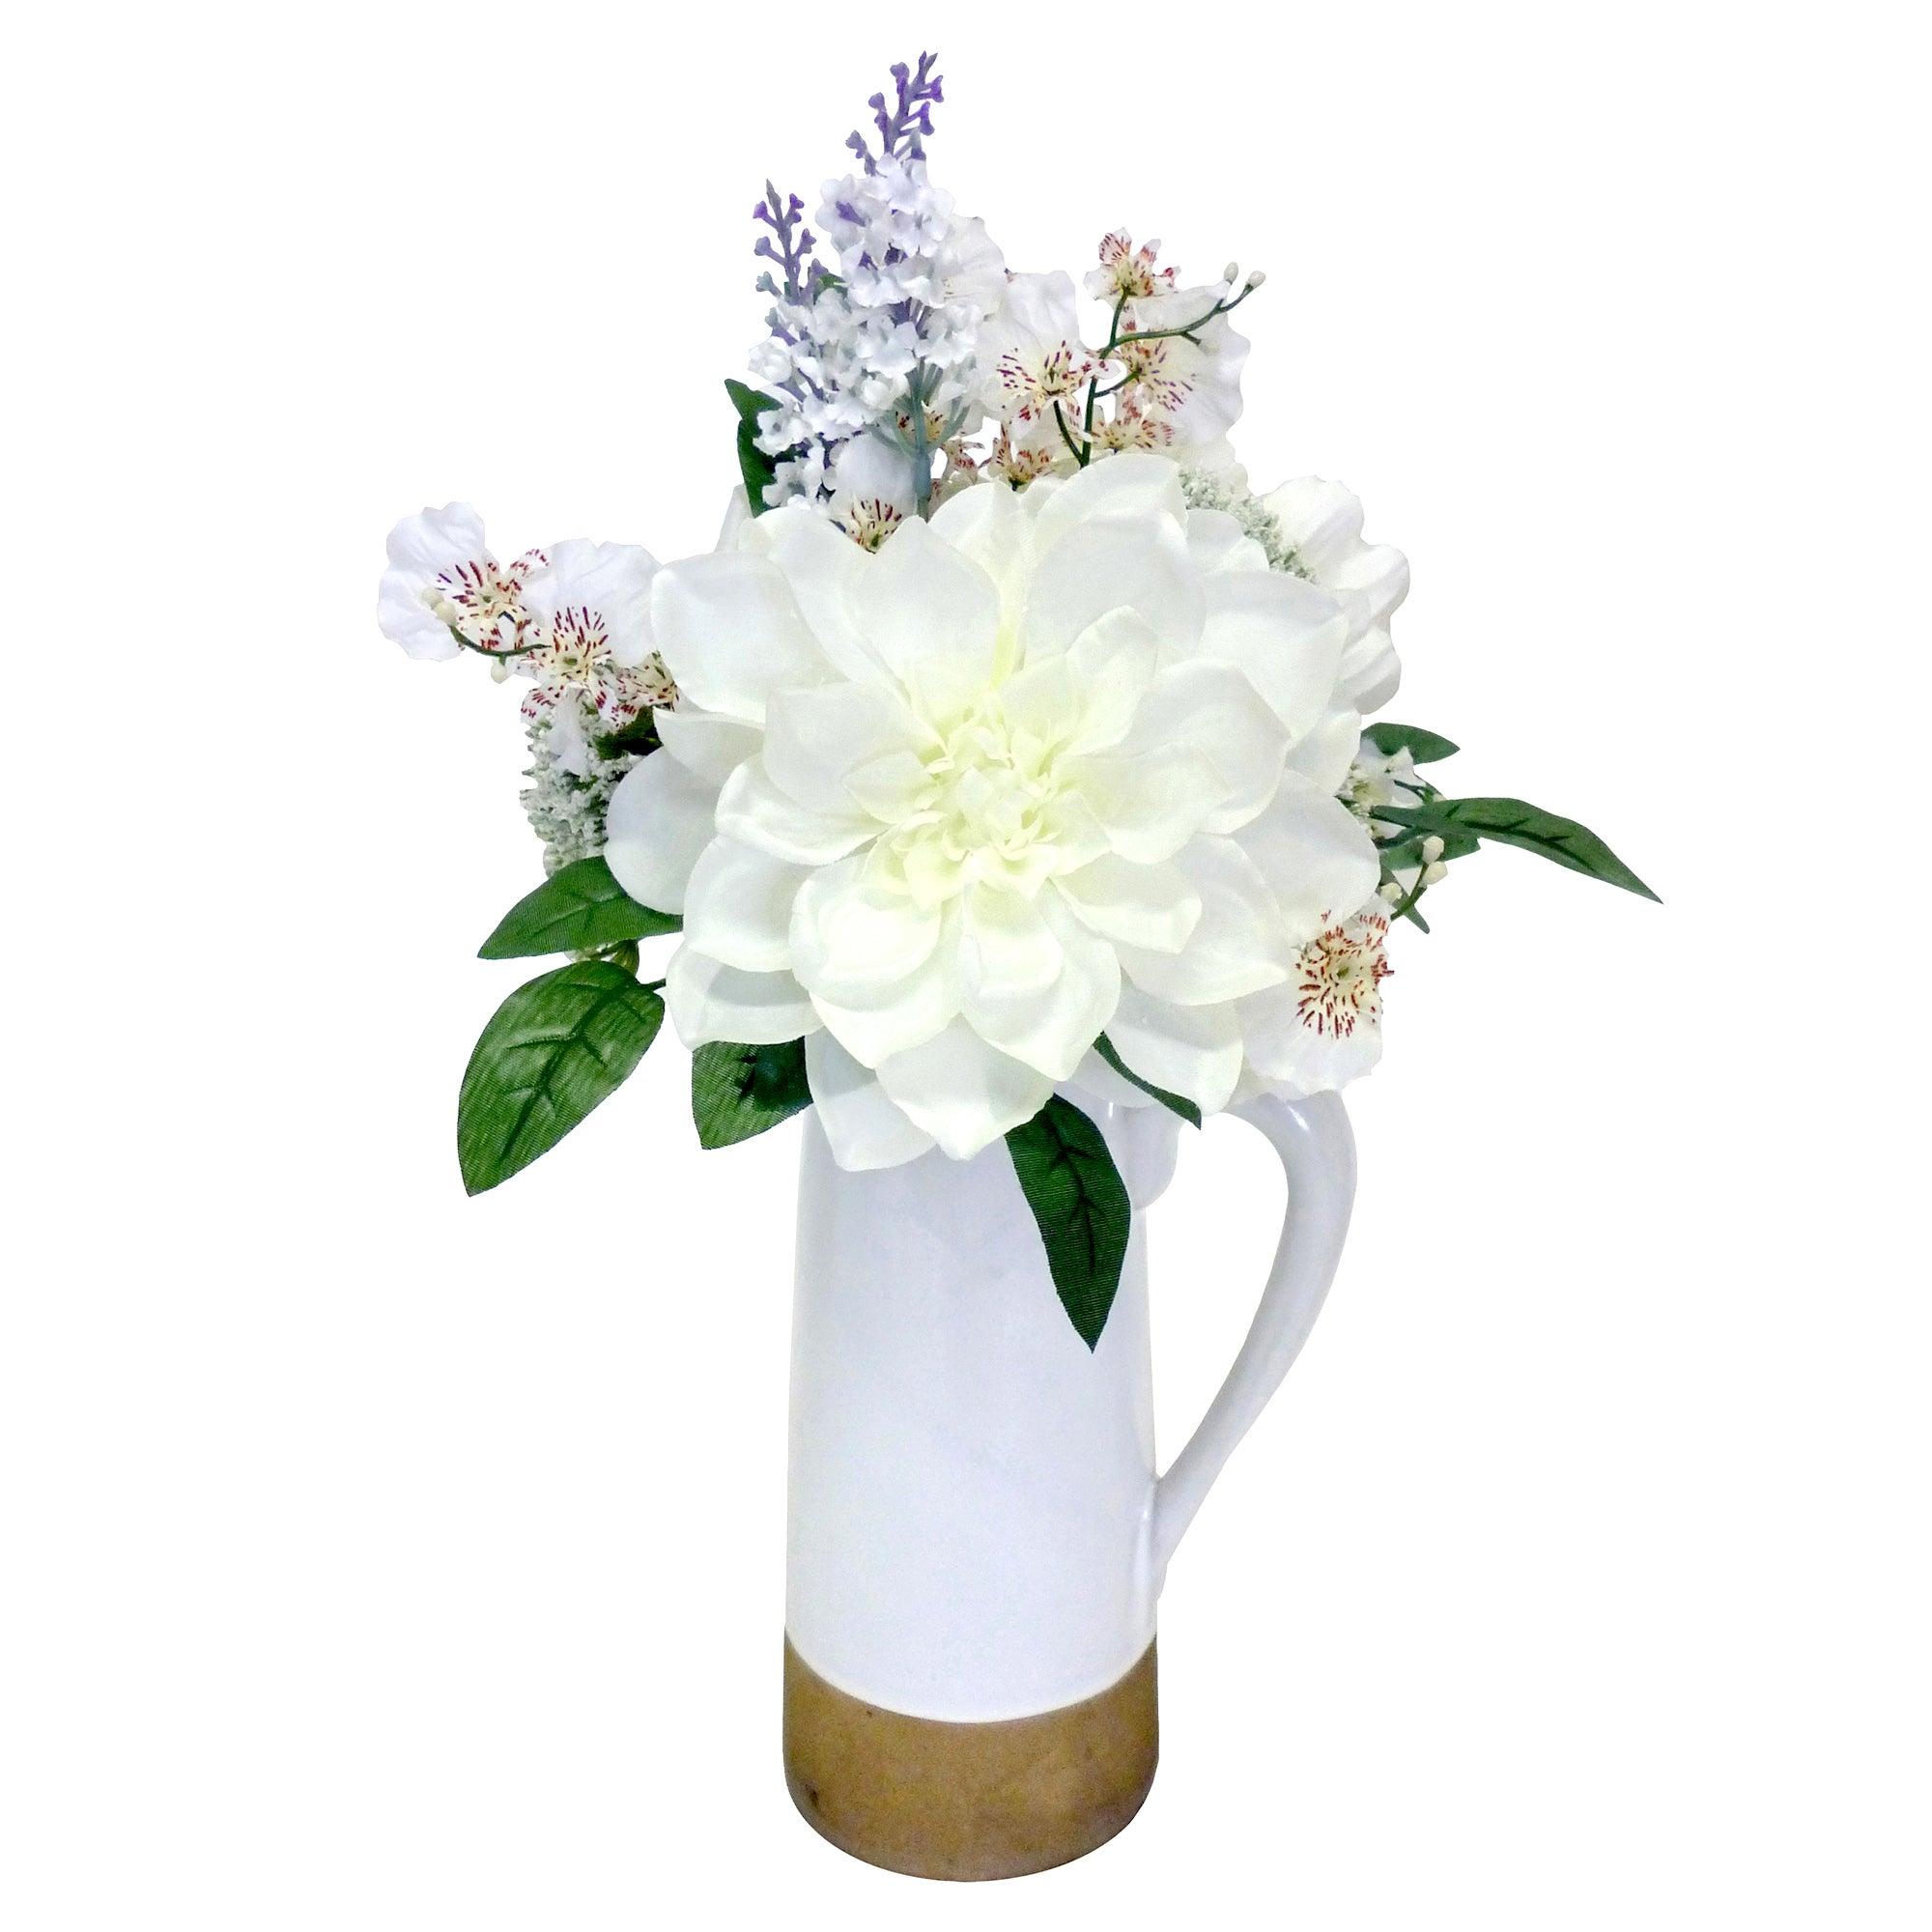 Flowers in Ceramic Jug